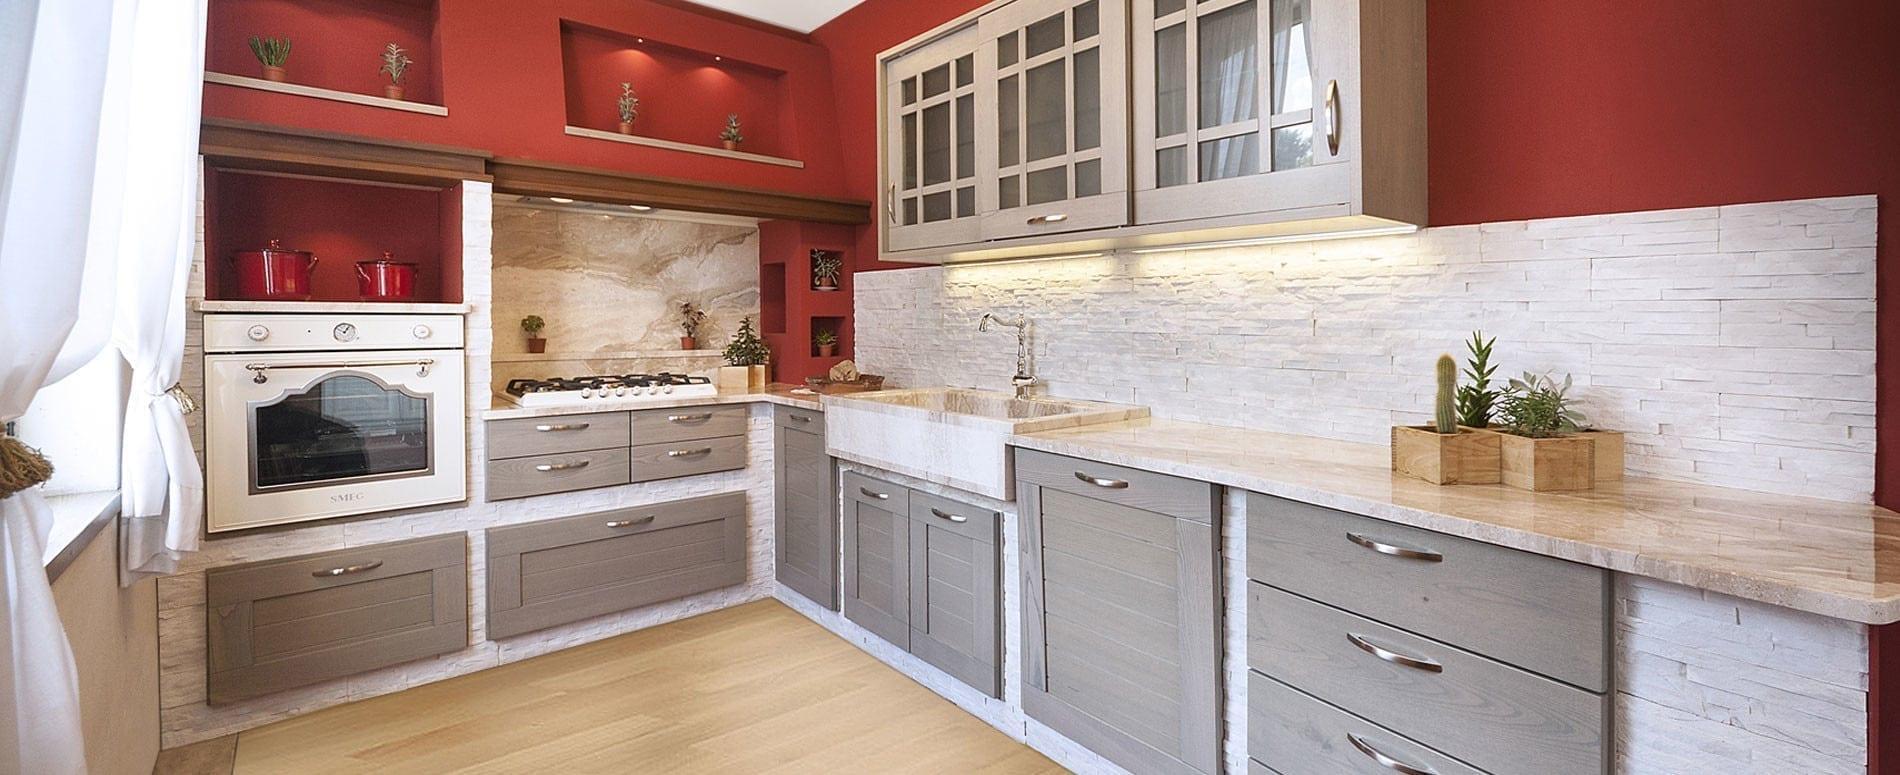 Pg arredamenti centro cucine su misura lucca firenze - Centro cucina firenze ...